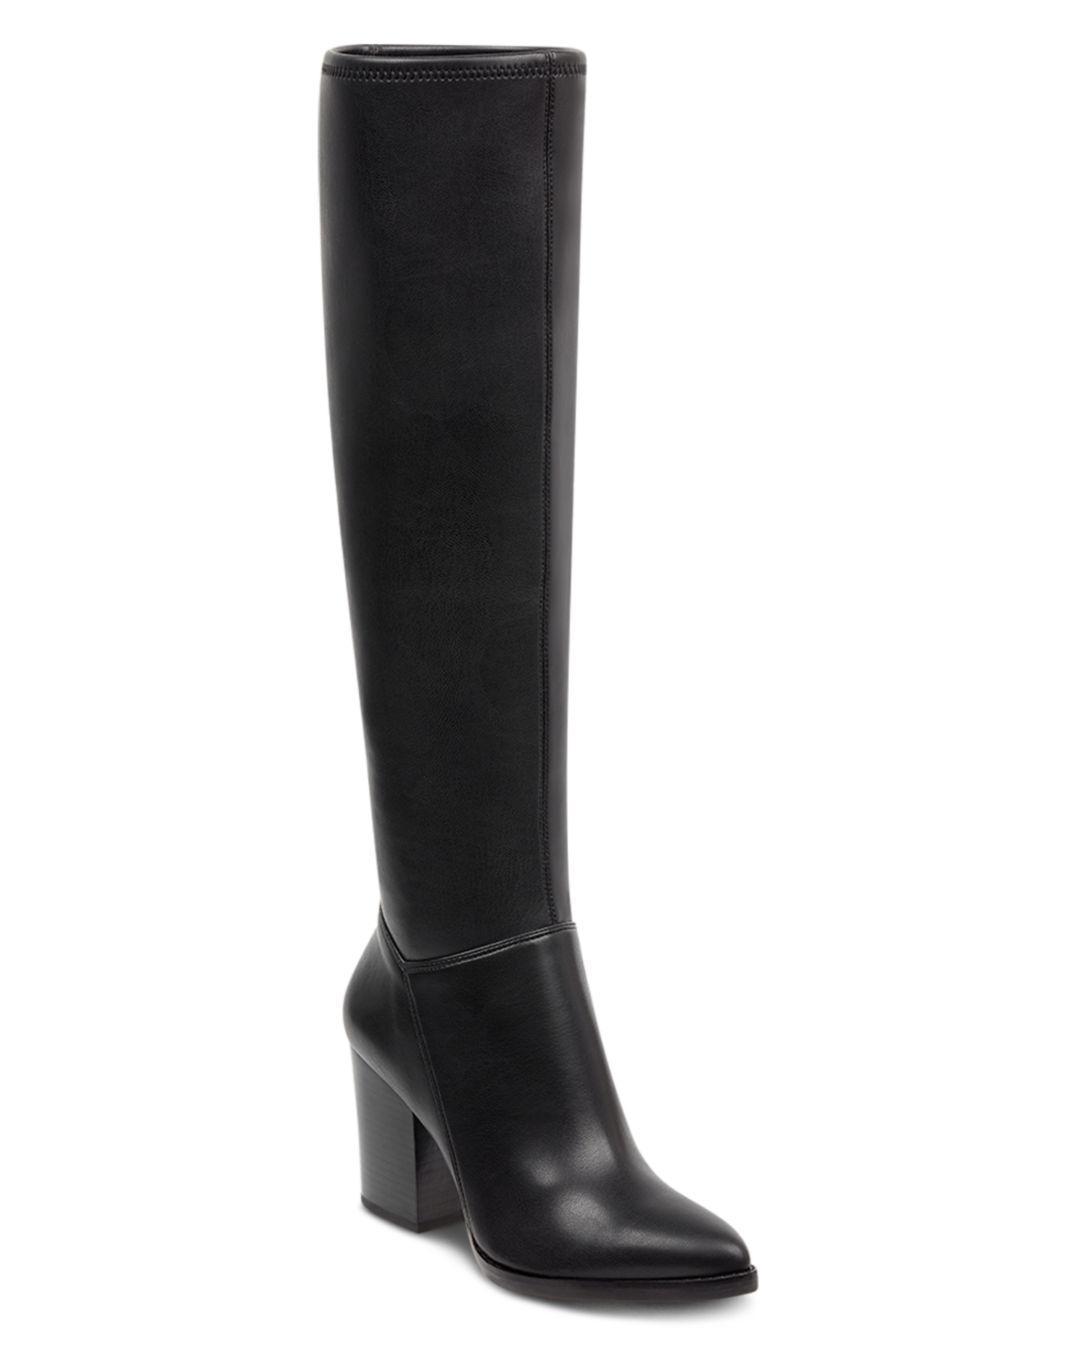 10d4004ca32b Marc Fisher Anata Knee High Boot (women) in Black - Lyst